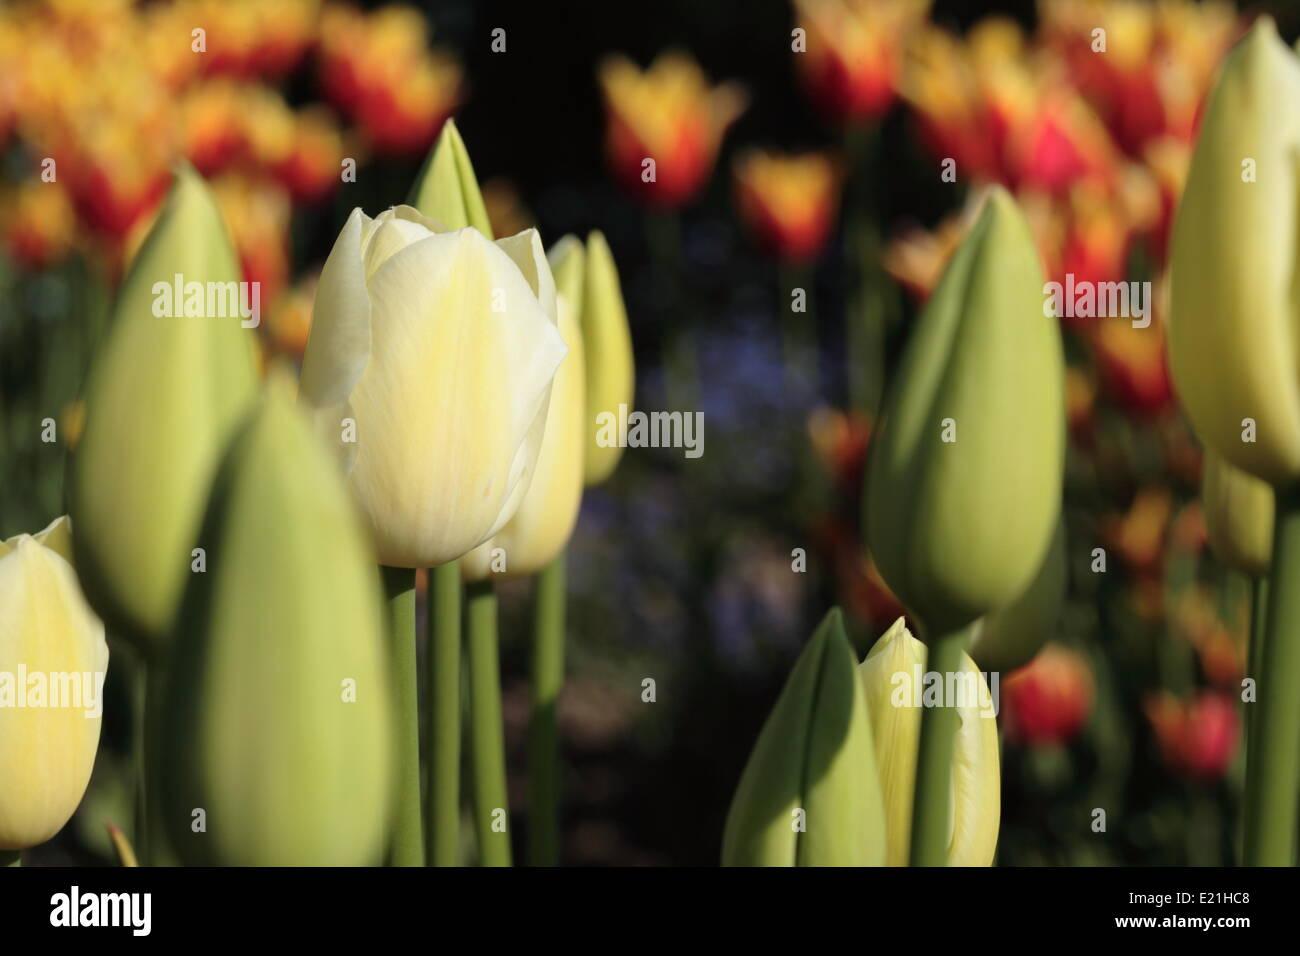 Triumph-Tulip 'Happy Generation' - Stock Image